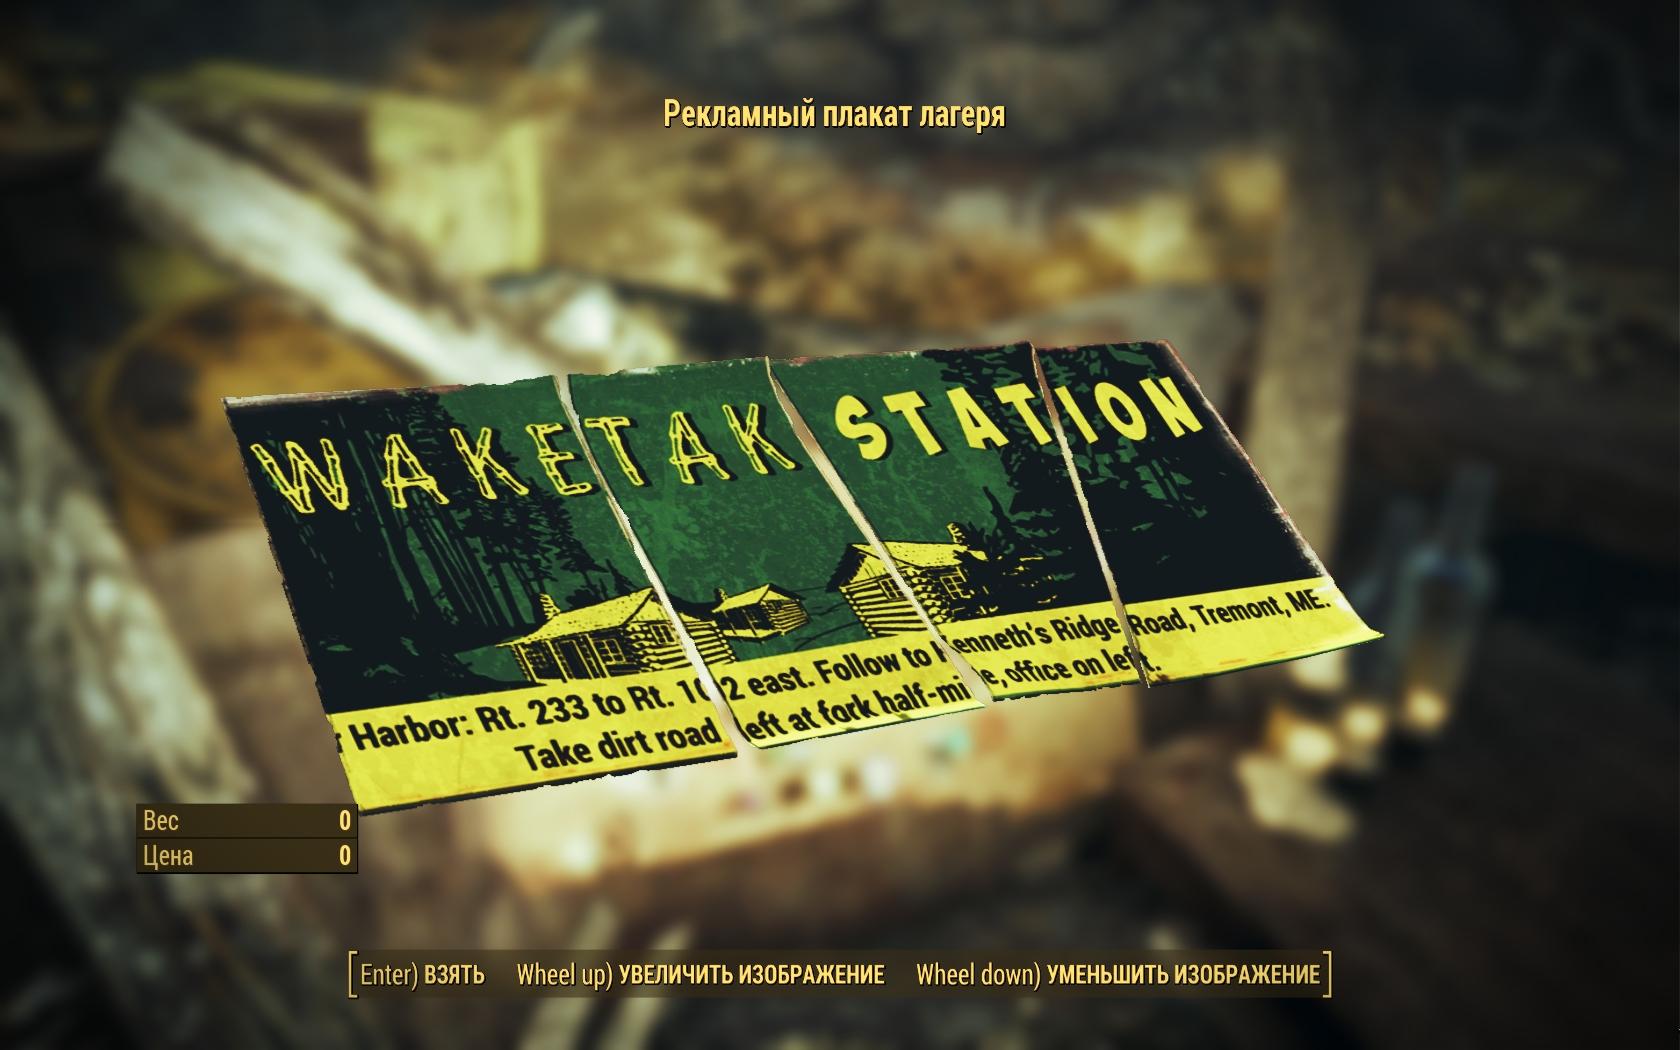 Рекламный плакат лагеря (Фар-Харбор) - Fallout 4 лагерь, плакат, Рекламный плакат лагеря